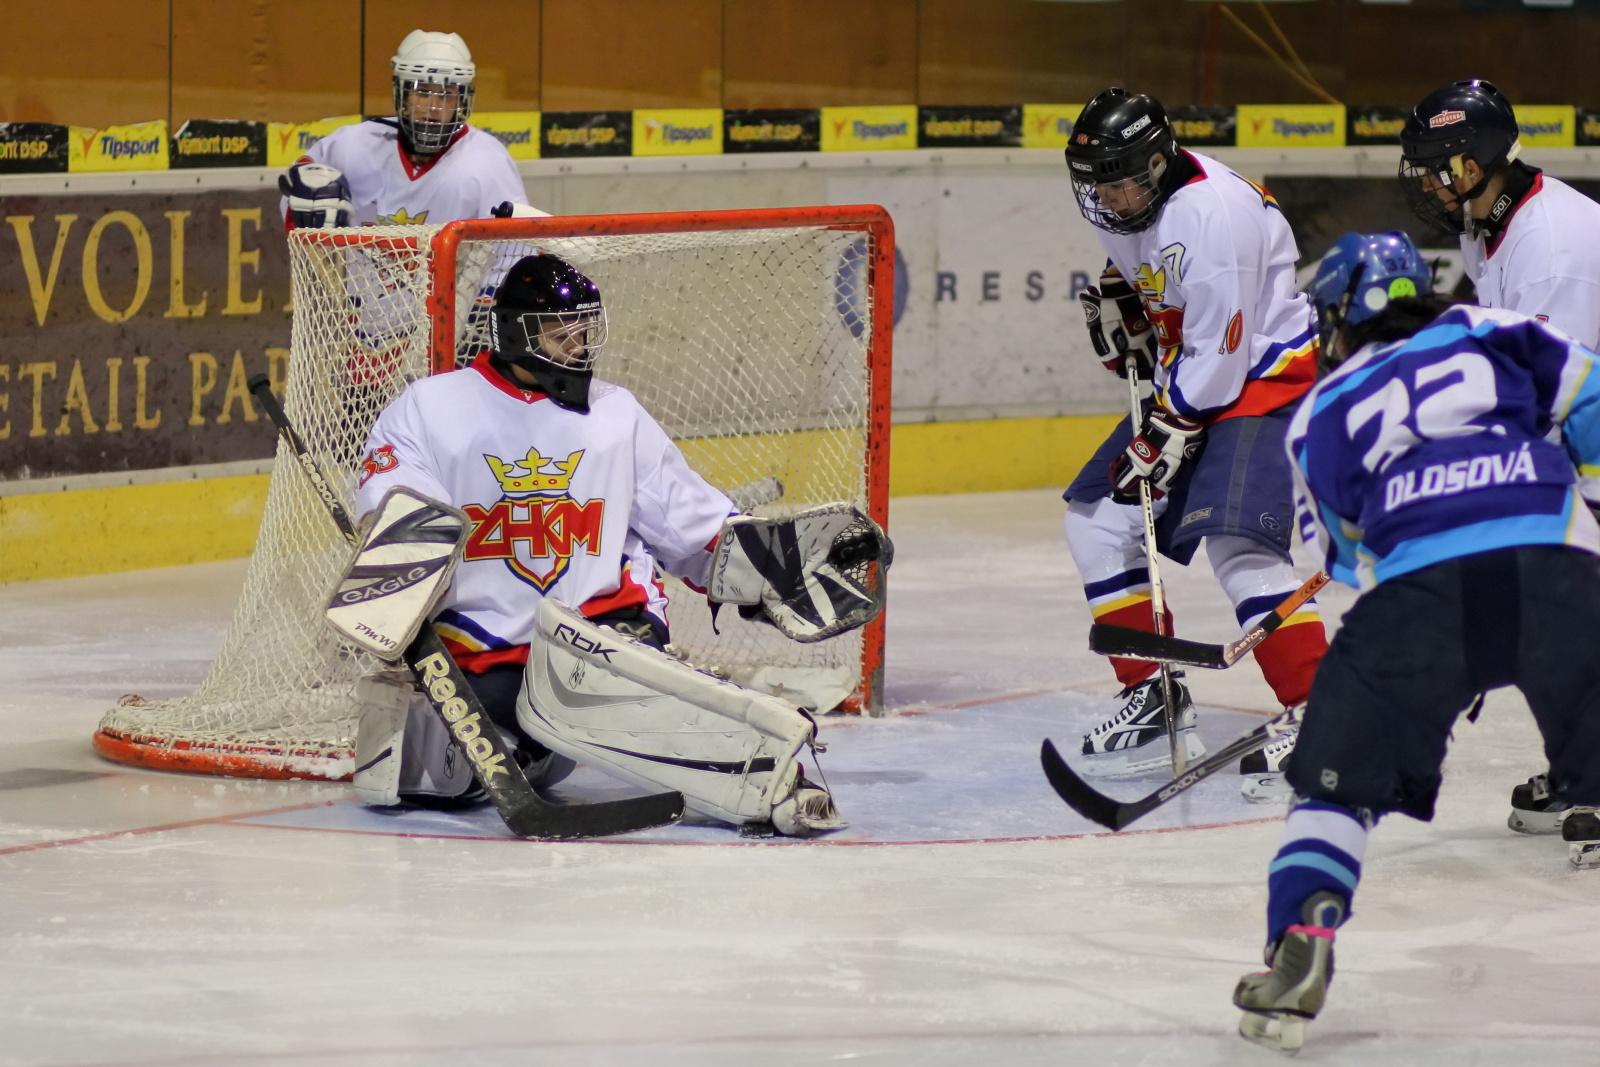 zhkm-zvolen-martin-hokej-2011-23